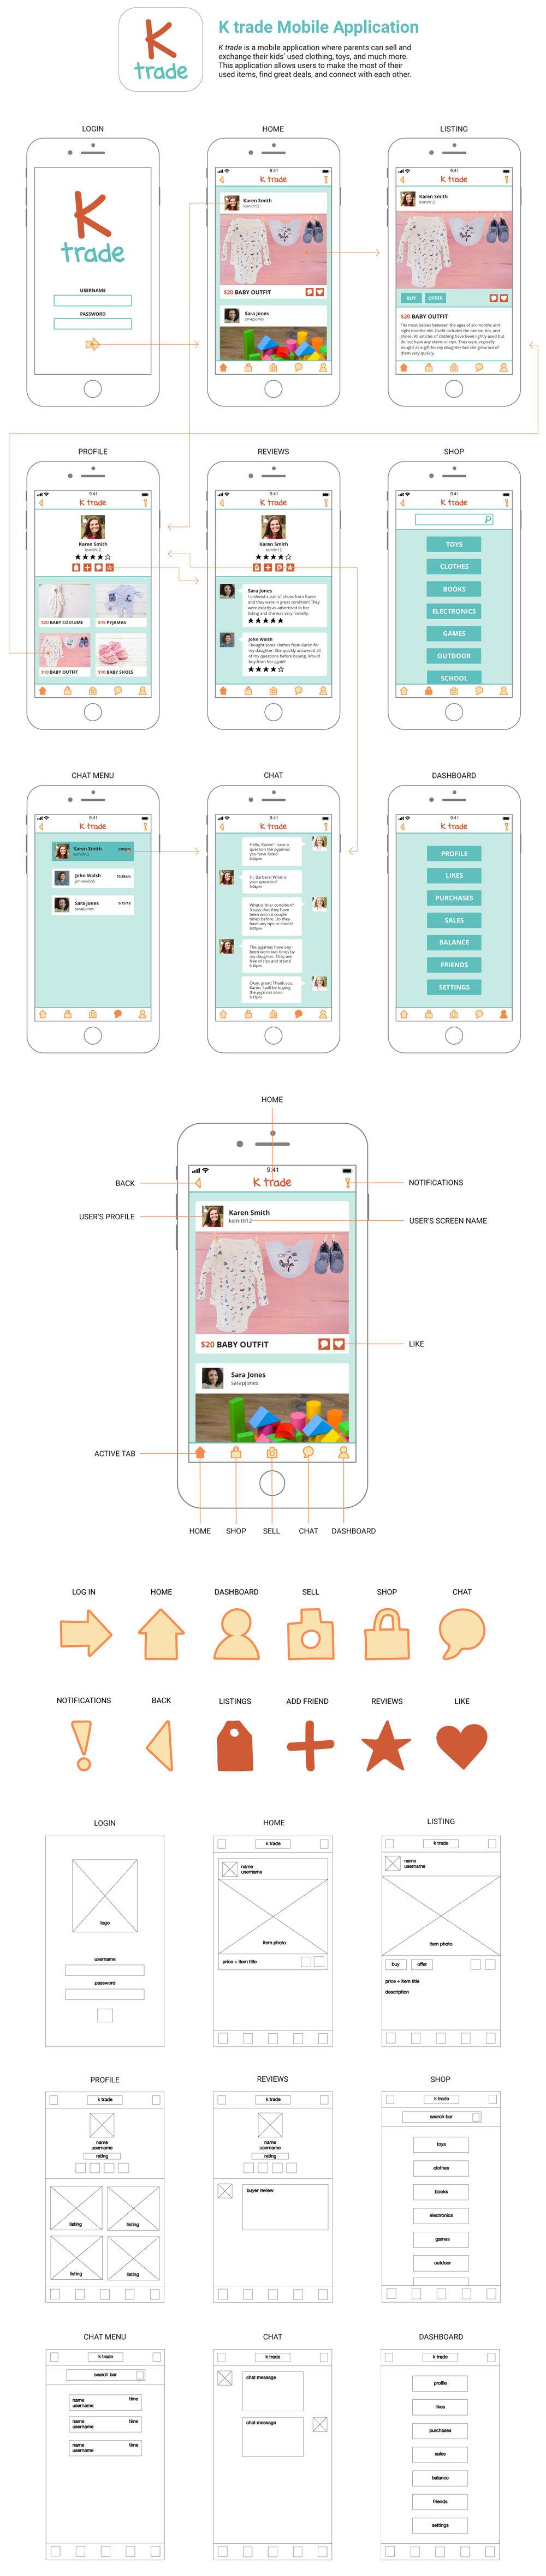 k-trade-web-2.jpg